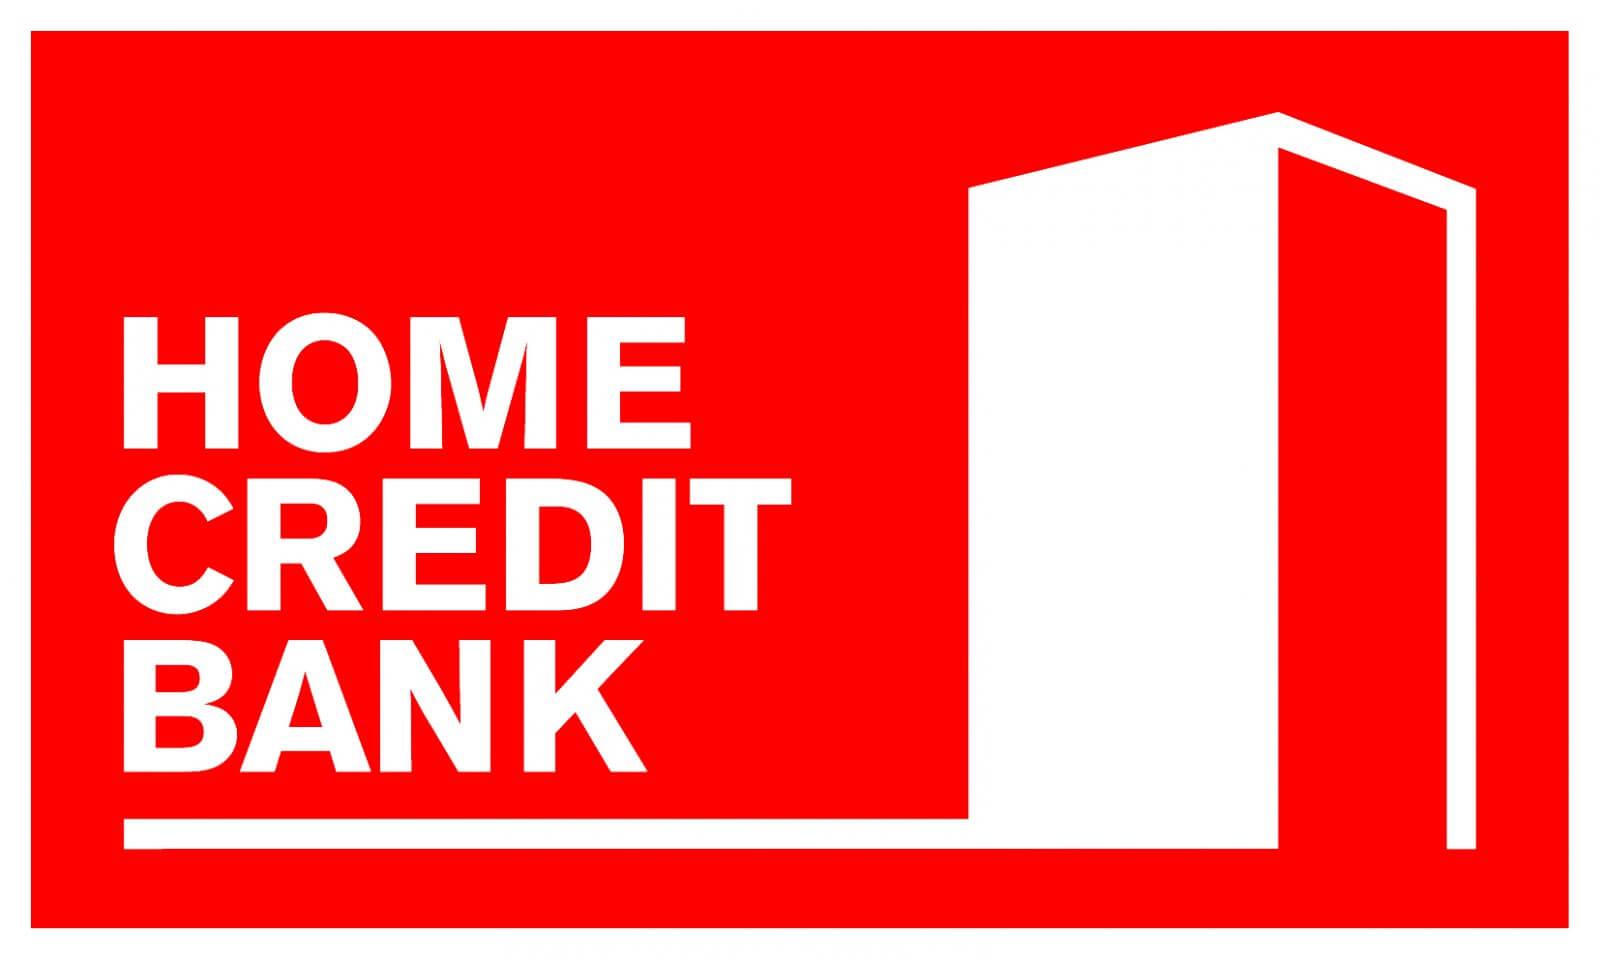 07e8bec8680de2339a443cffcb65fdca0b9e6951_1600 - Взять кредит в Подольске